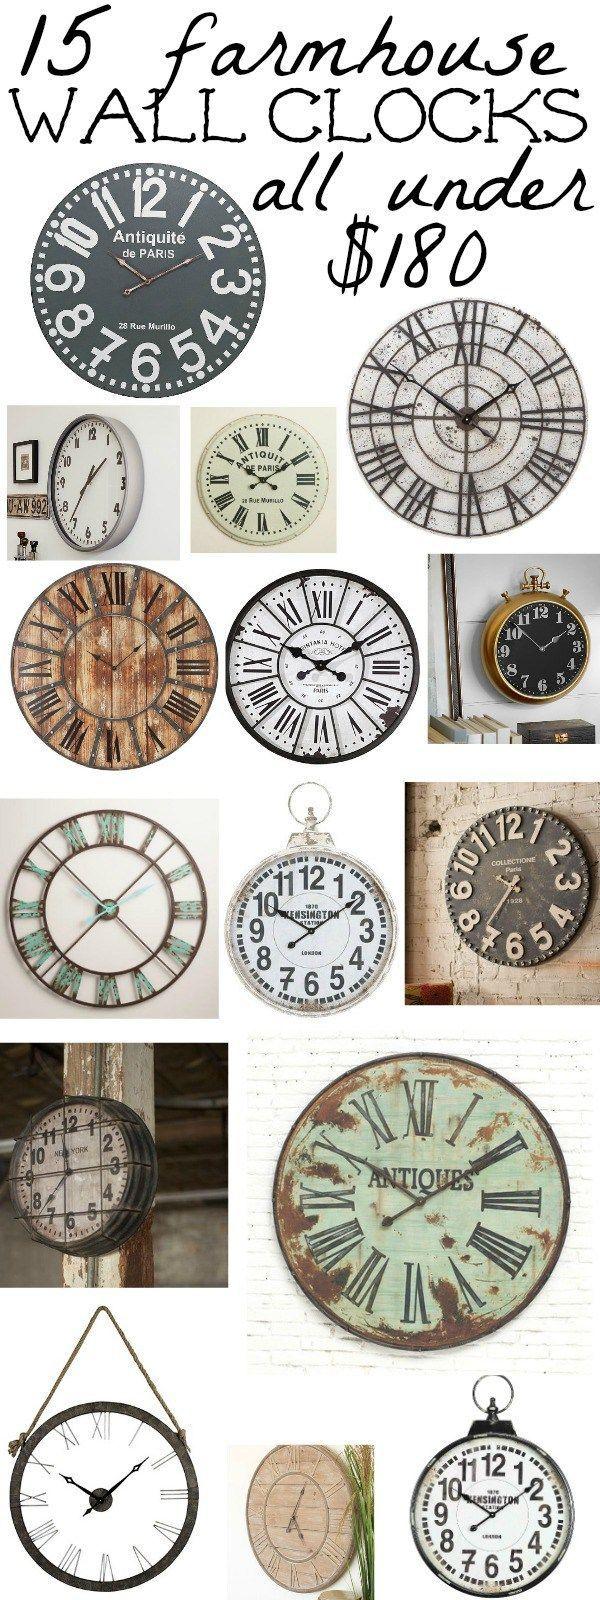 15 Farmhouse Clocks Under 180 Farmhouse Clocks